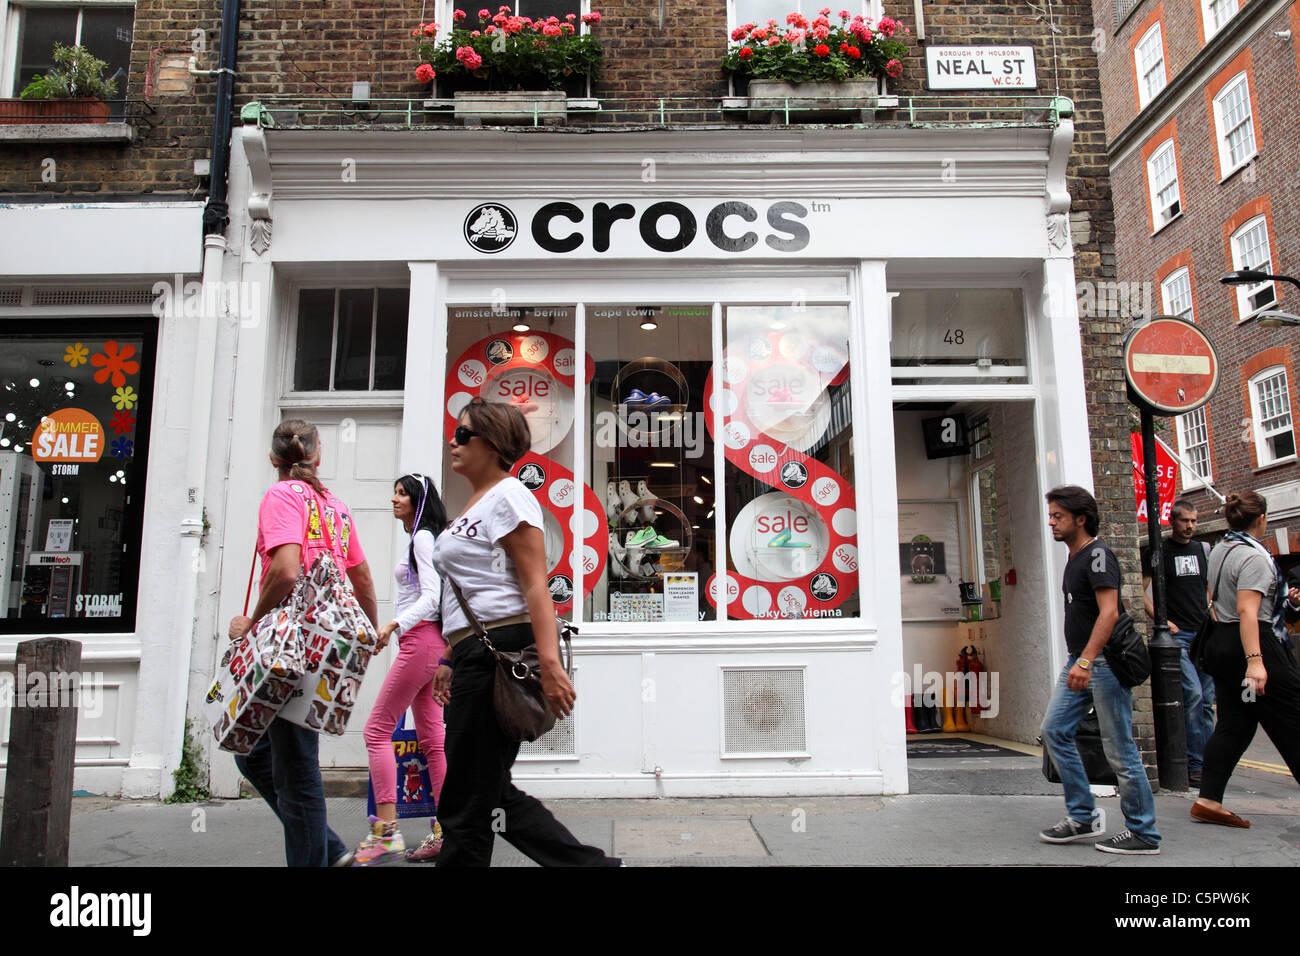 92a3bf442a4 Crocs Store Photos   Crocs Store Images - Alamy